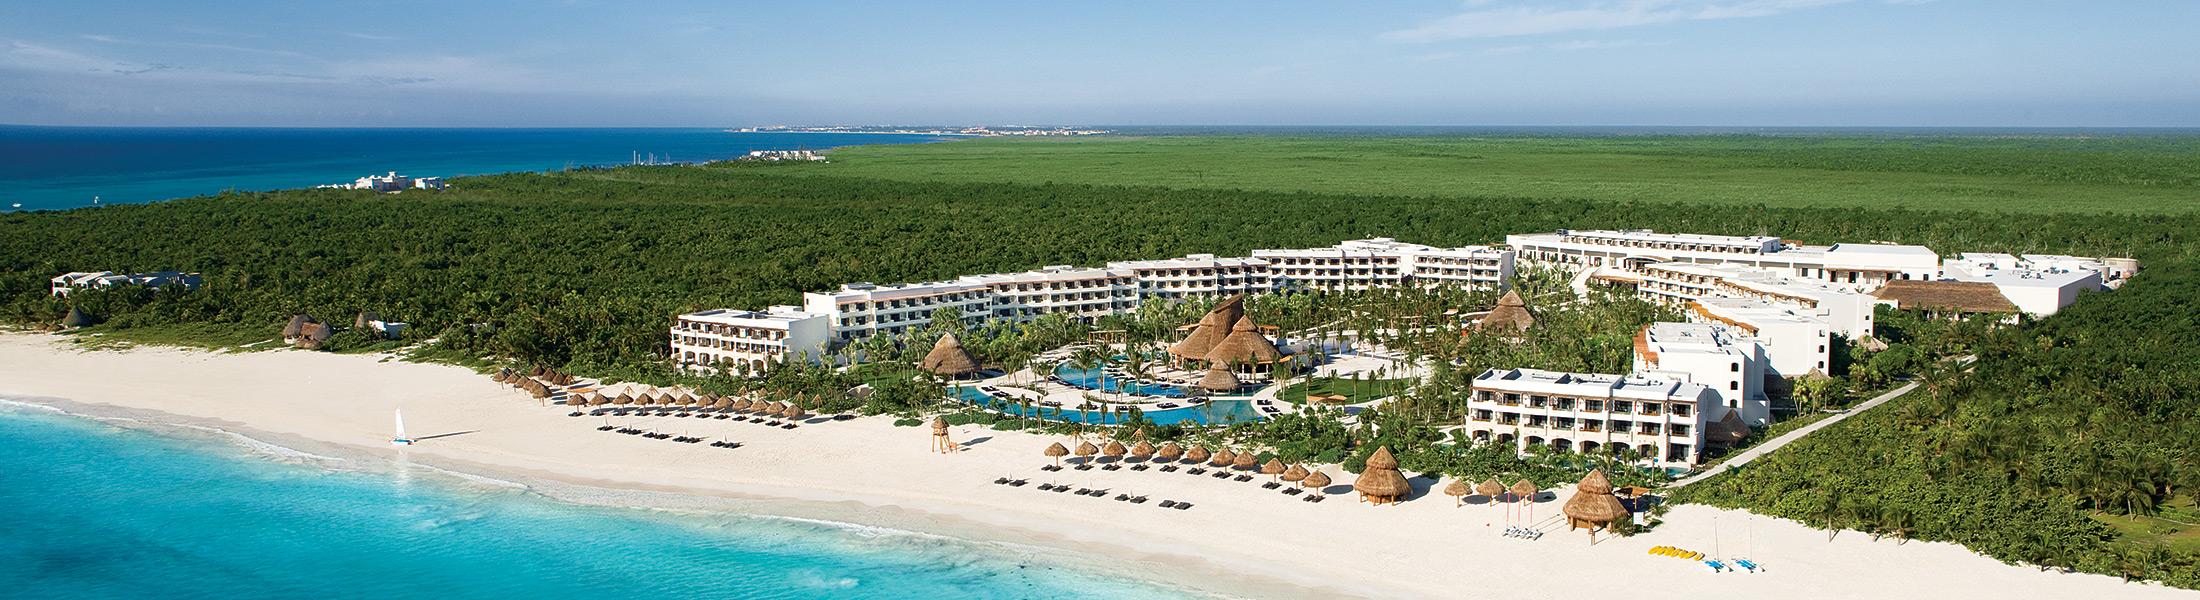 Aerial view of Secrets Maroma Beach Riviera